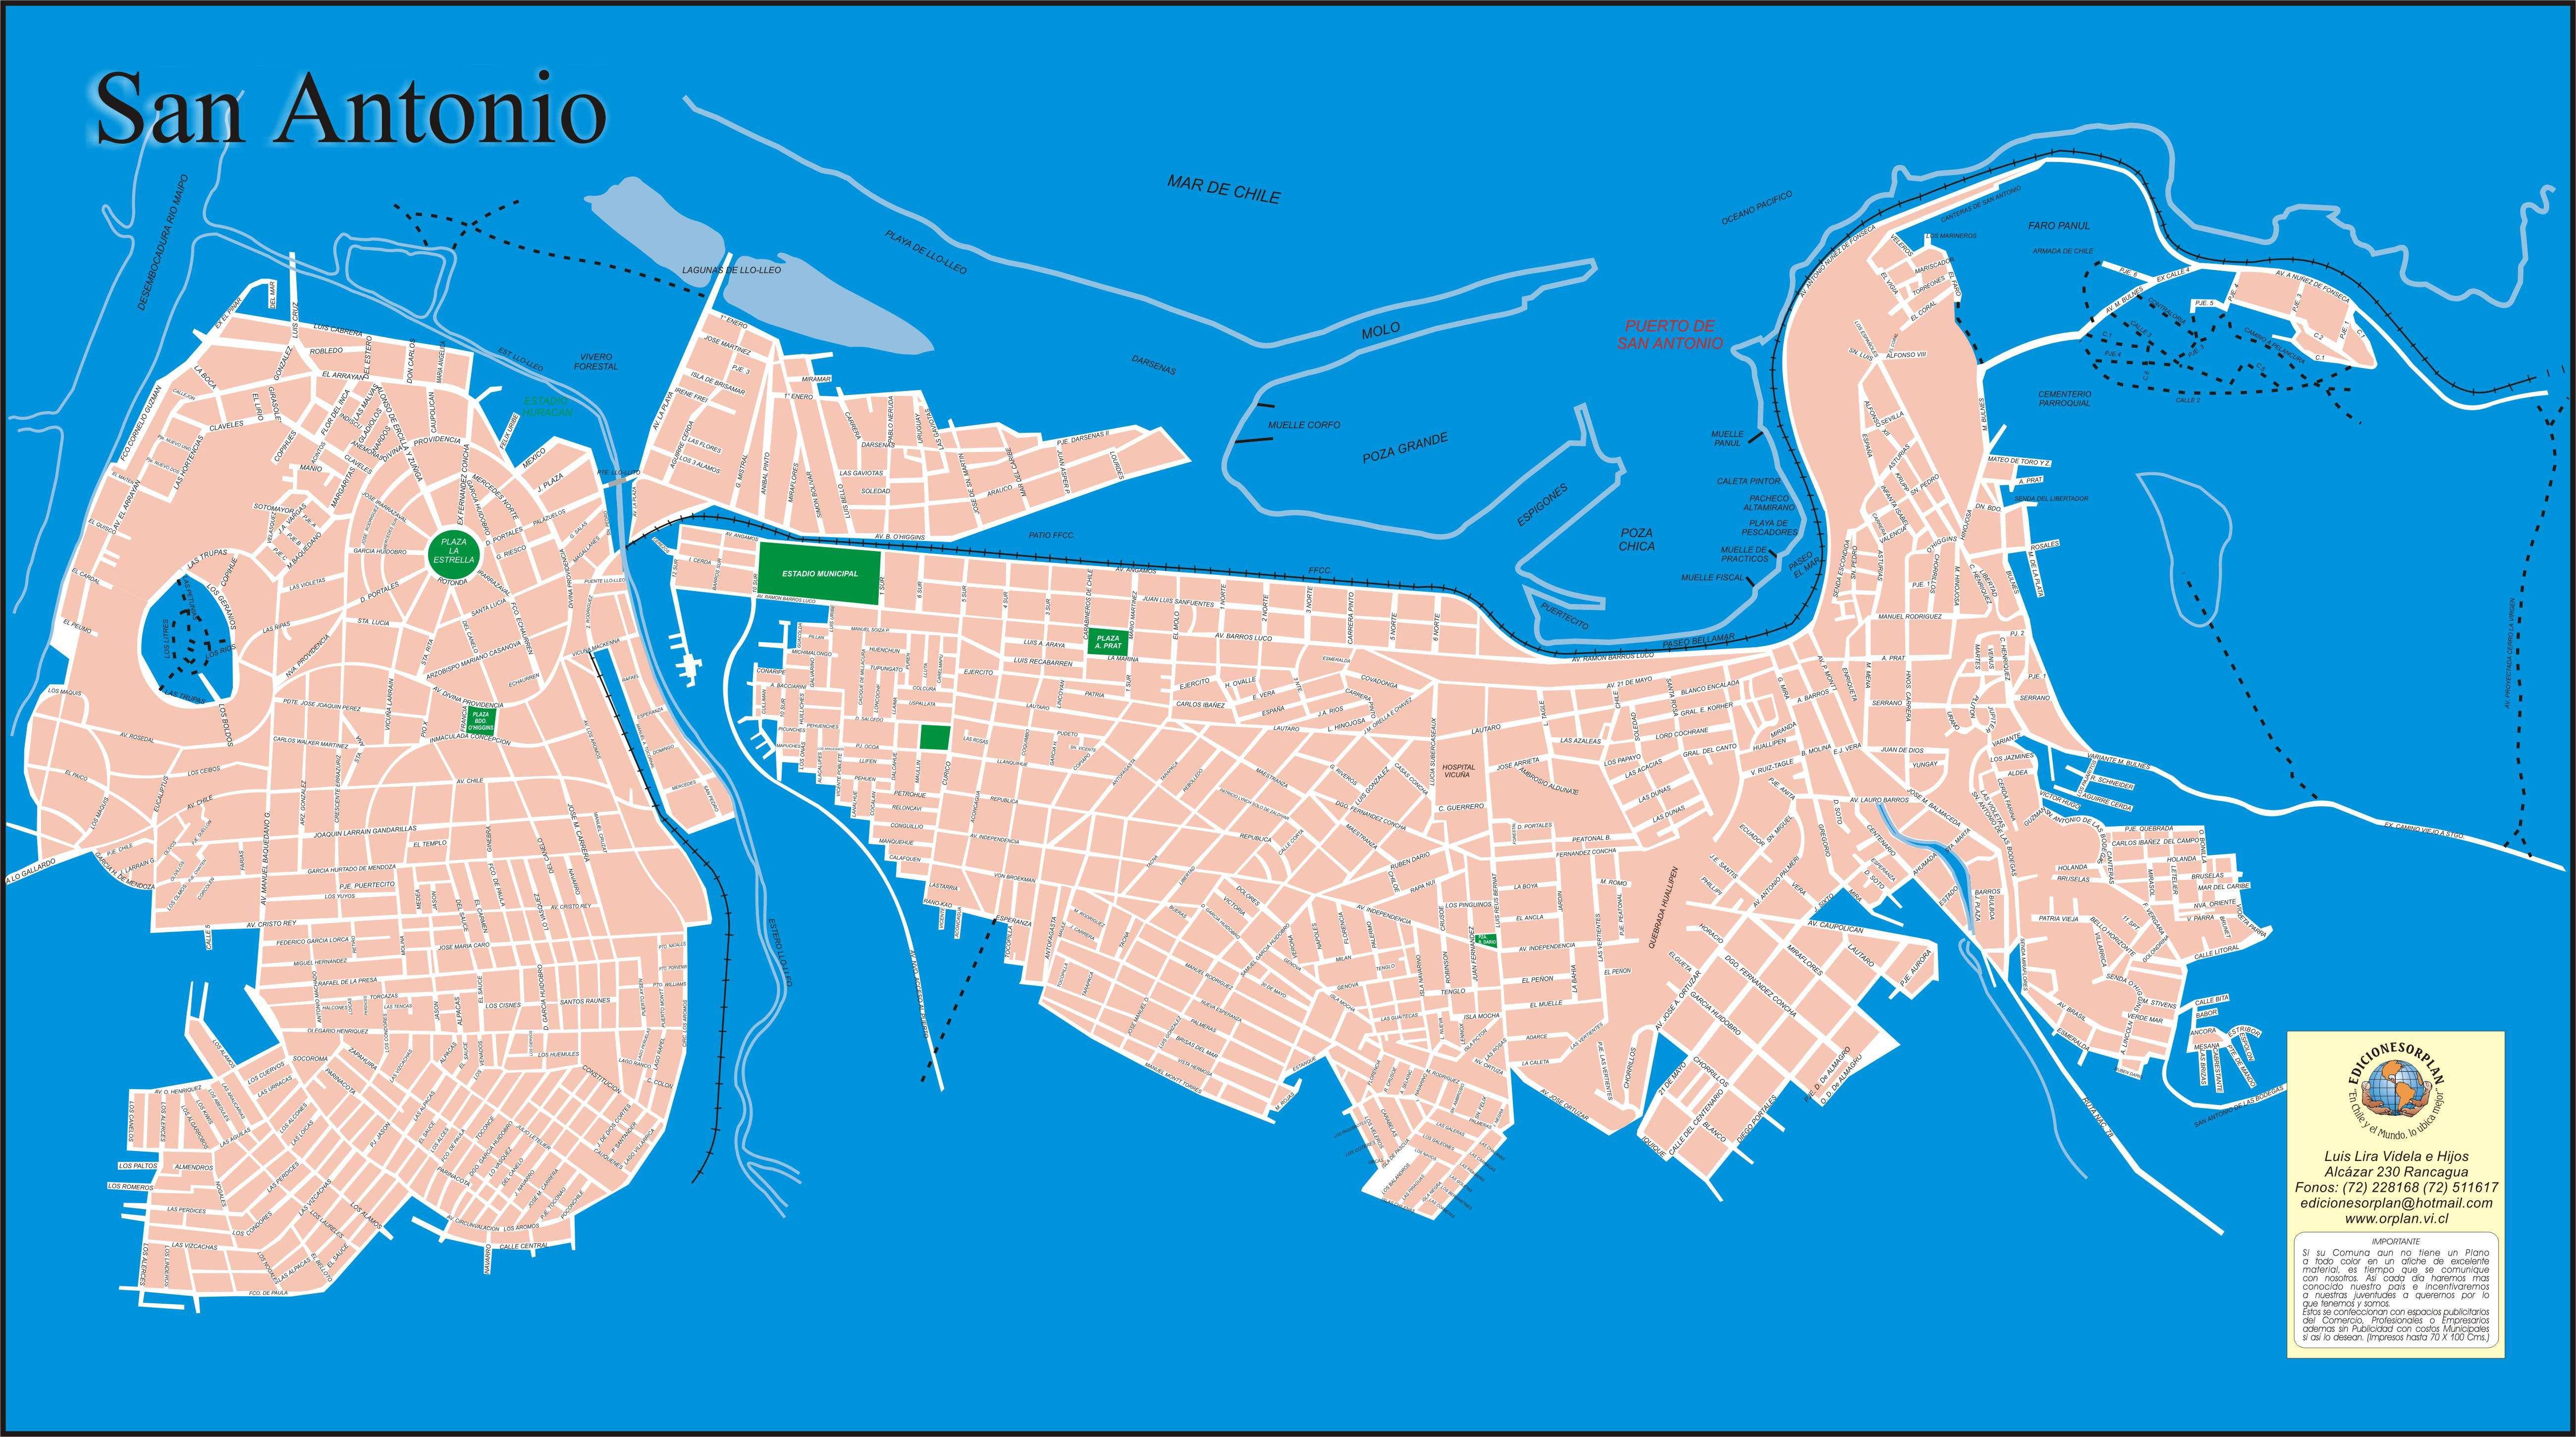 Large San Antonio Maps For Free Download And Print | High-Resolution - San Antonio Texas Maps